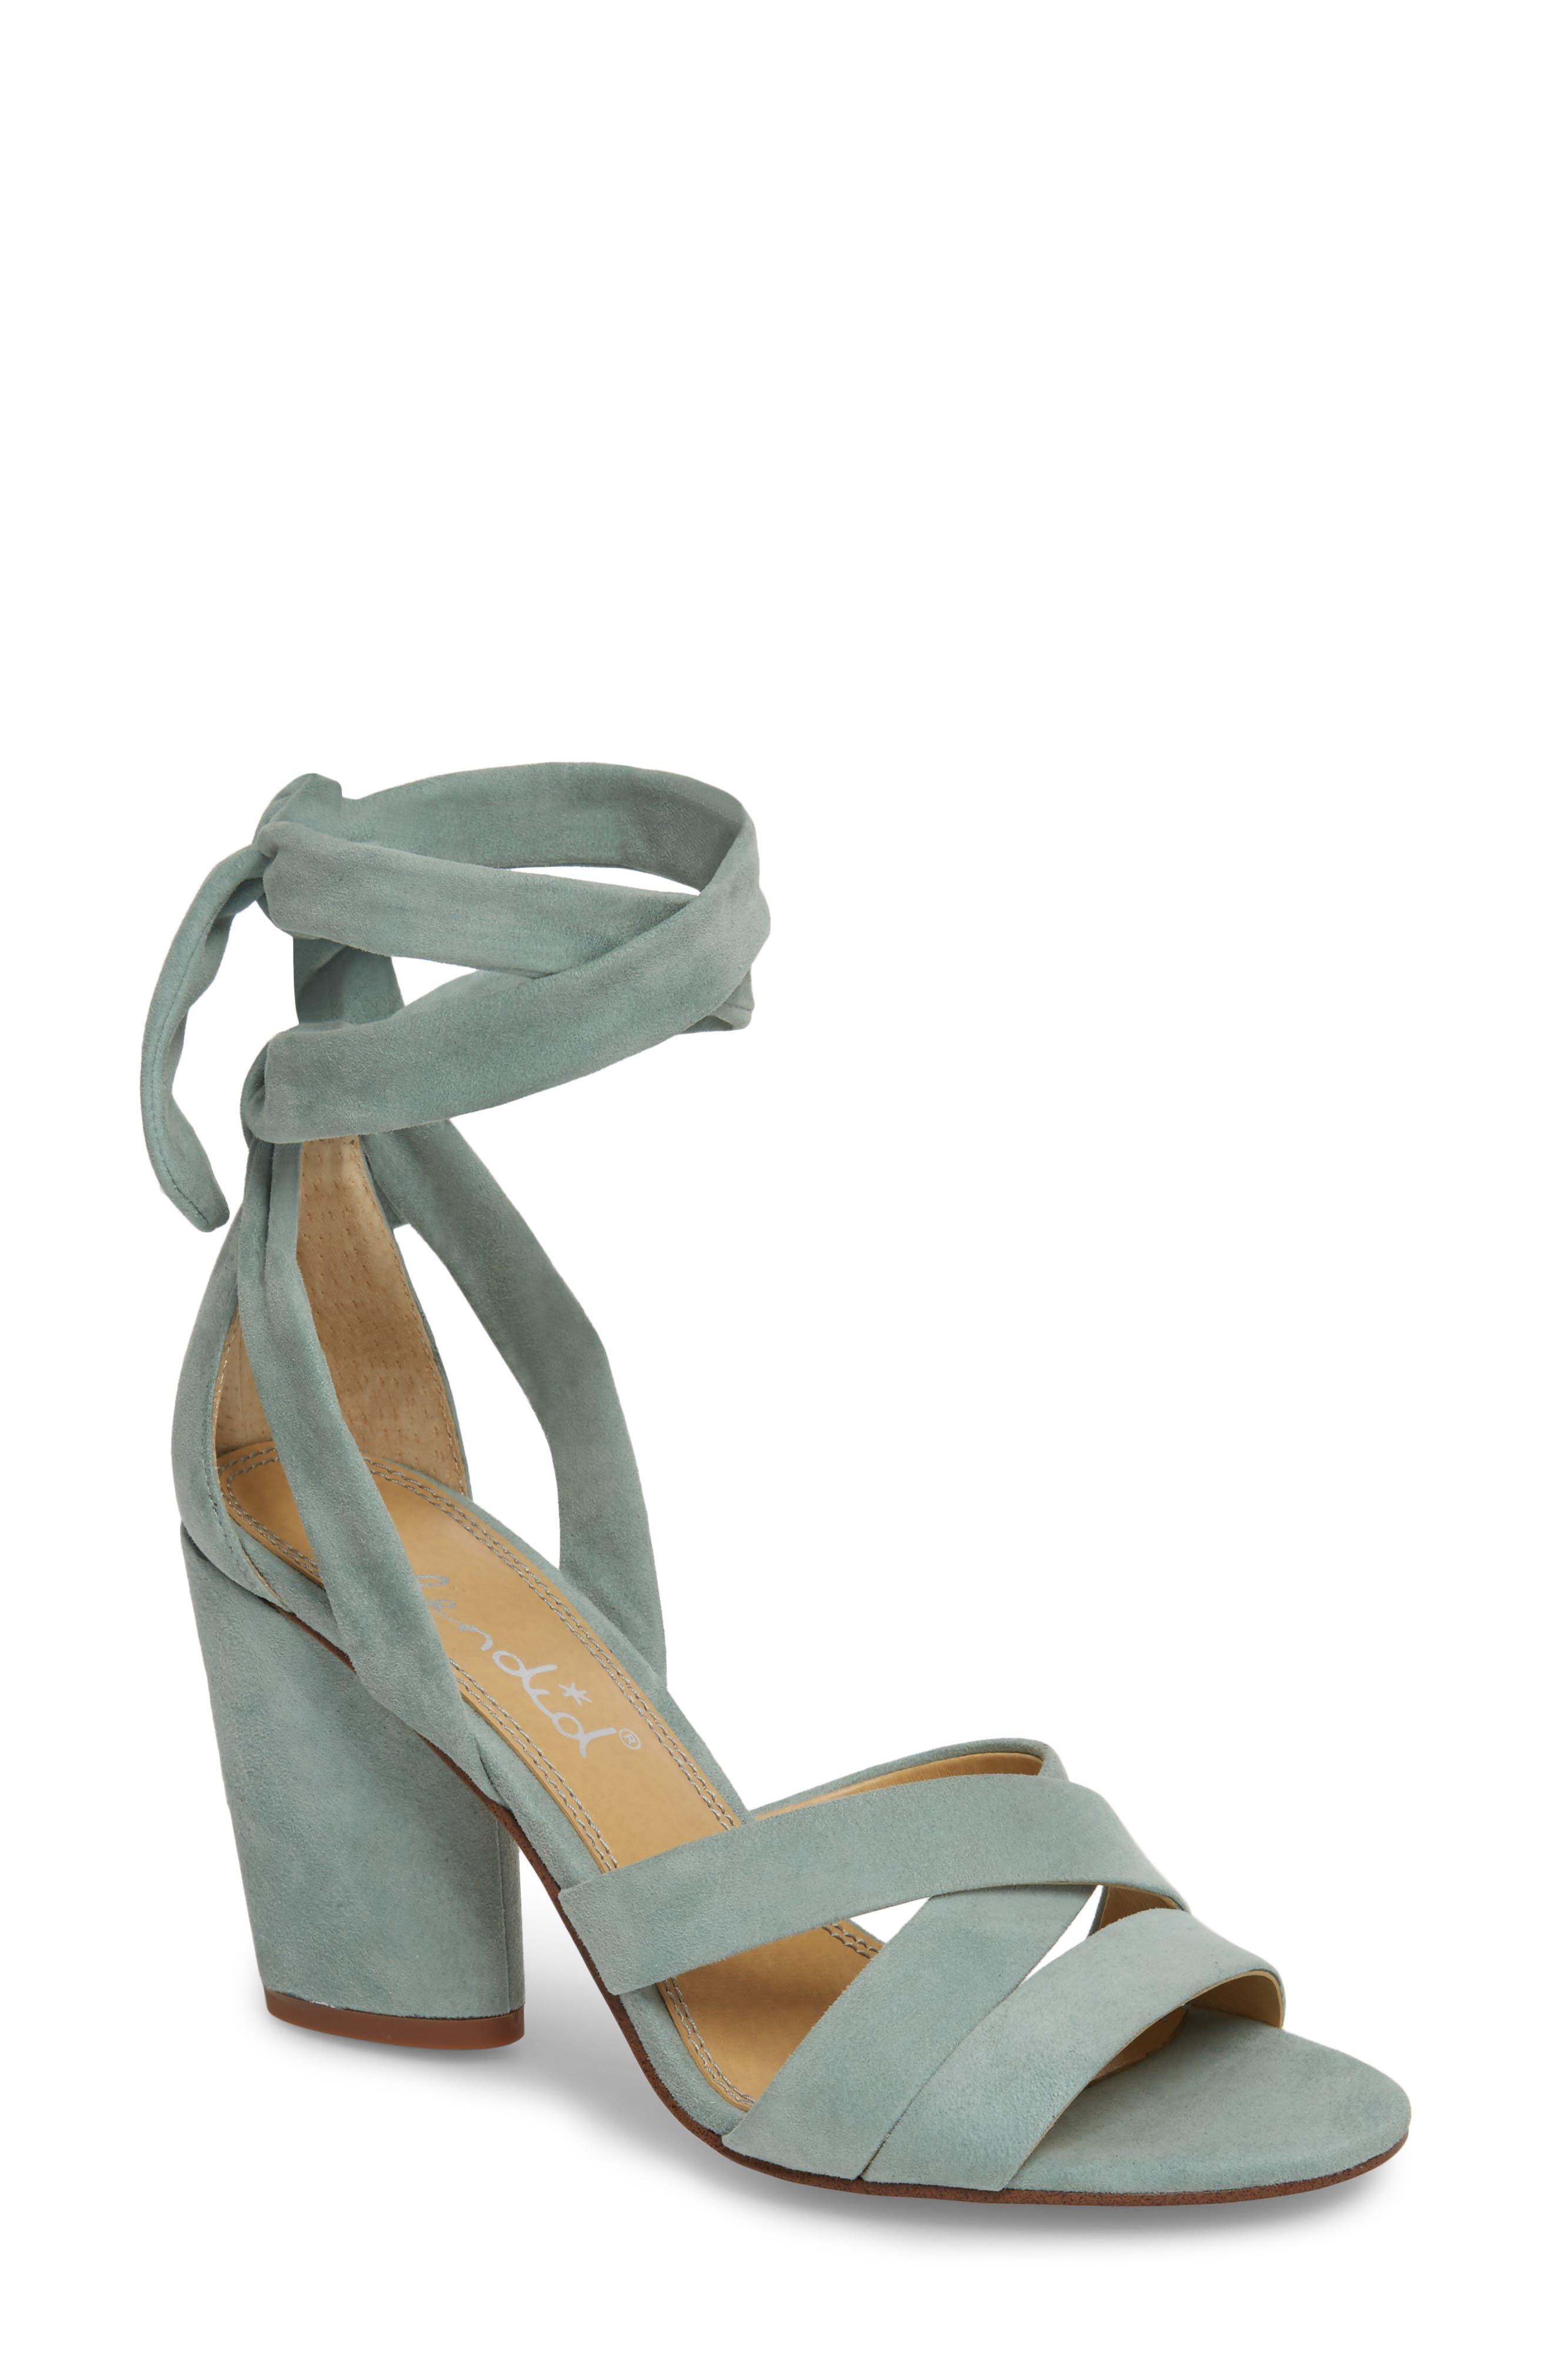 Splendid Fergie Lace-Up Sandal, Green